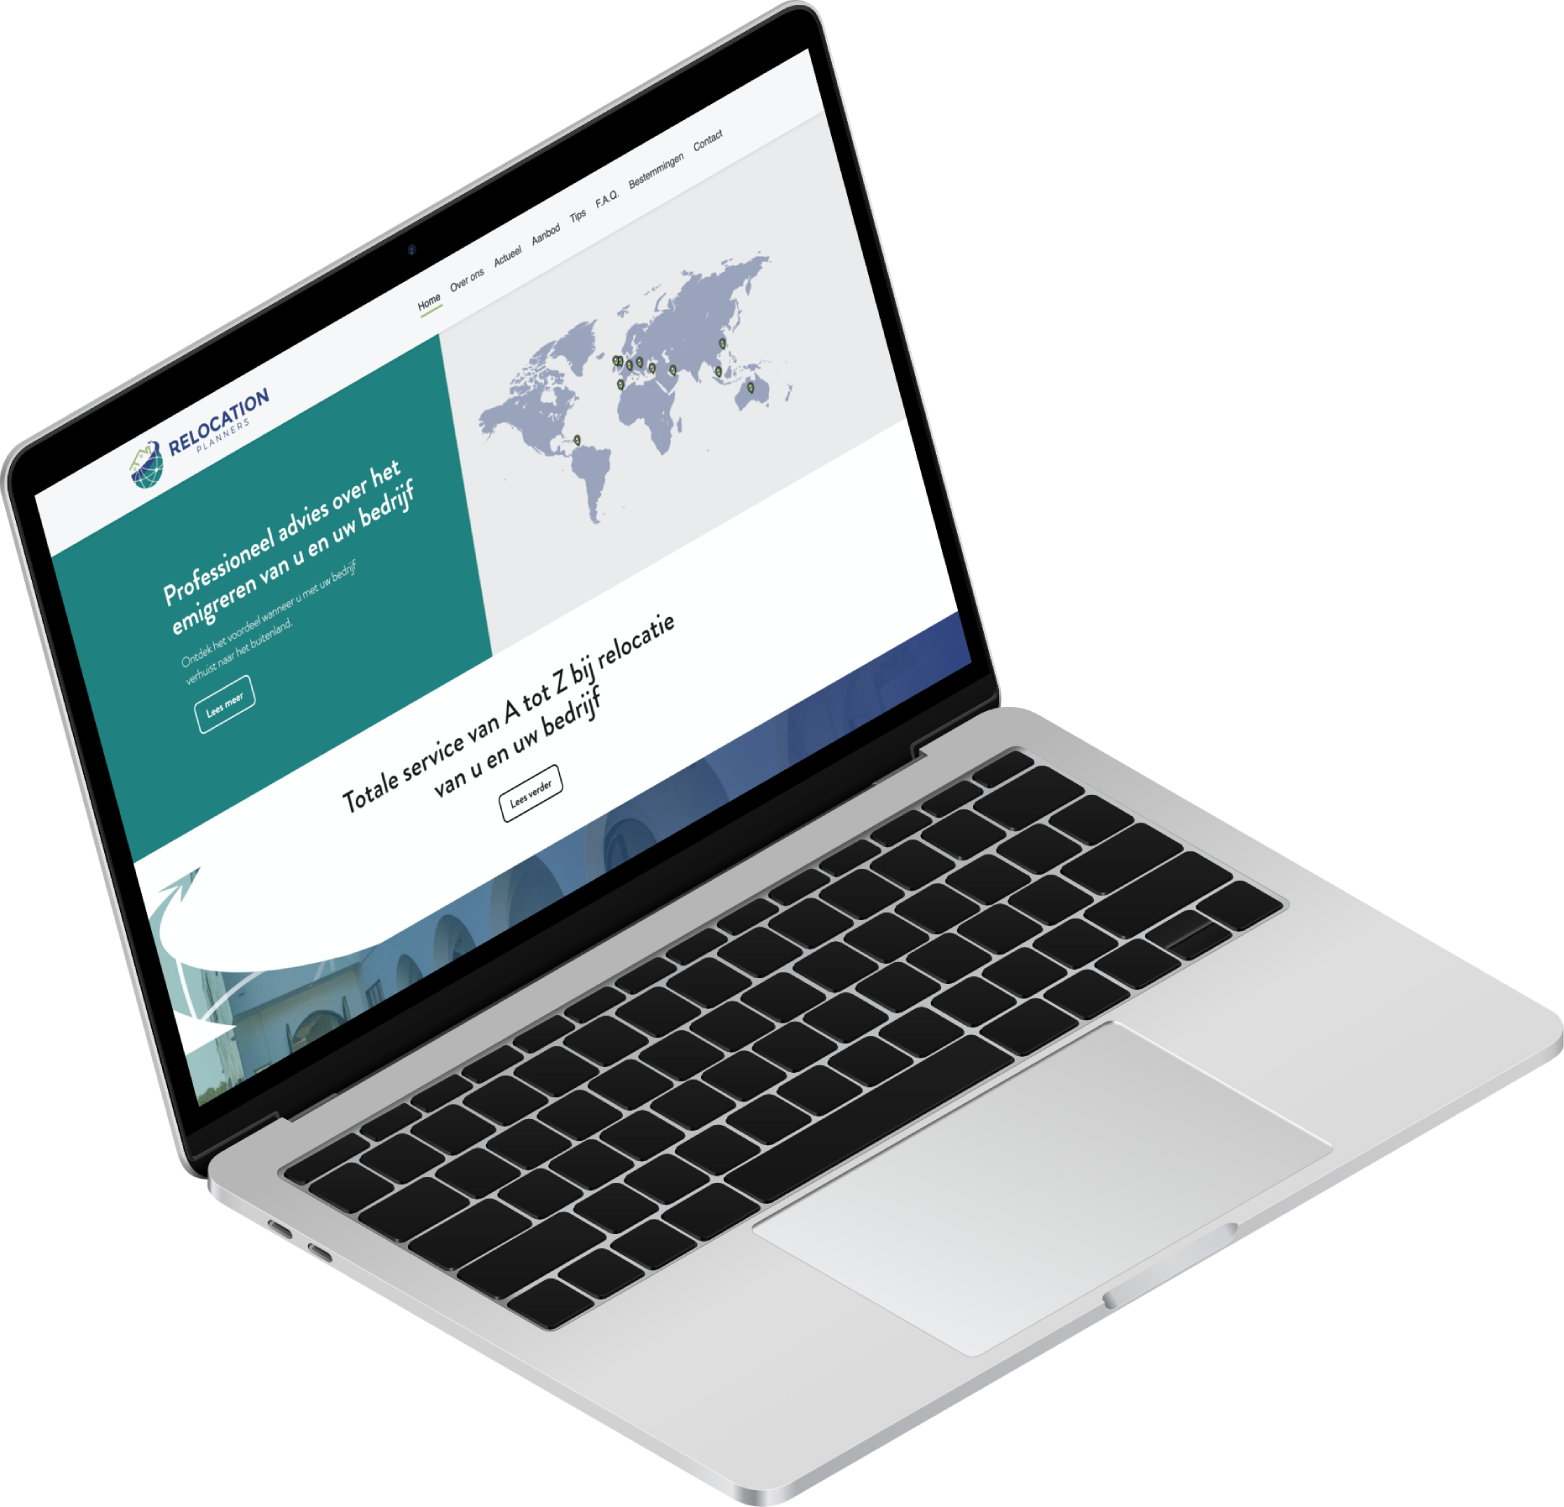 relocation-planners-webhosting-Urmond